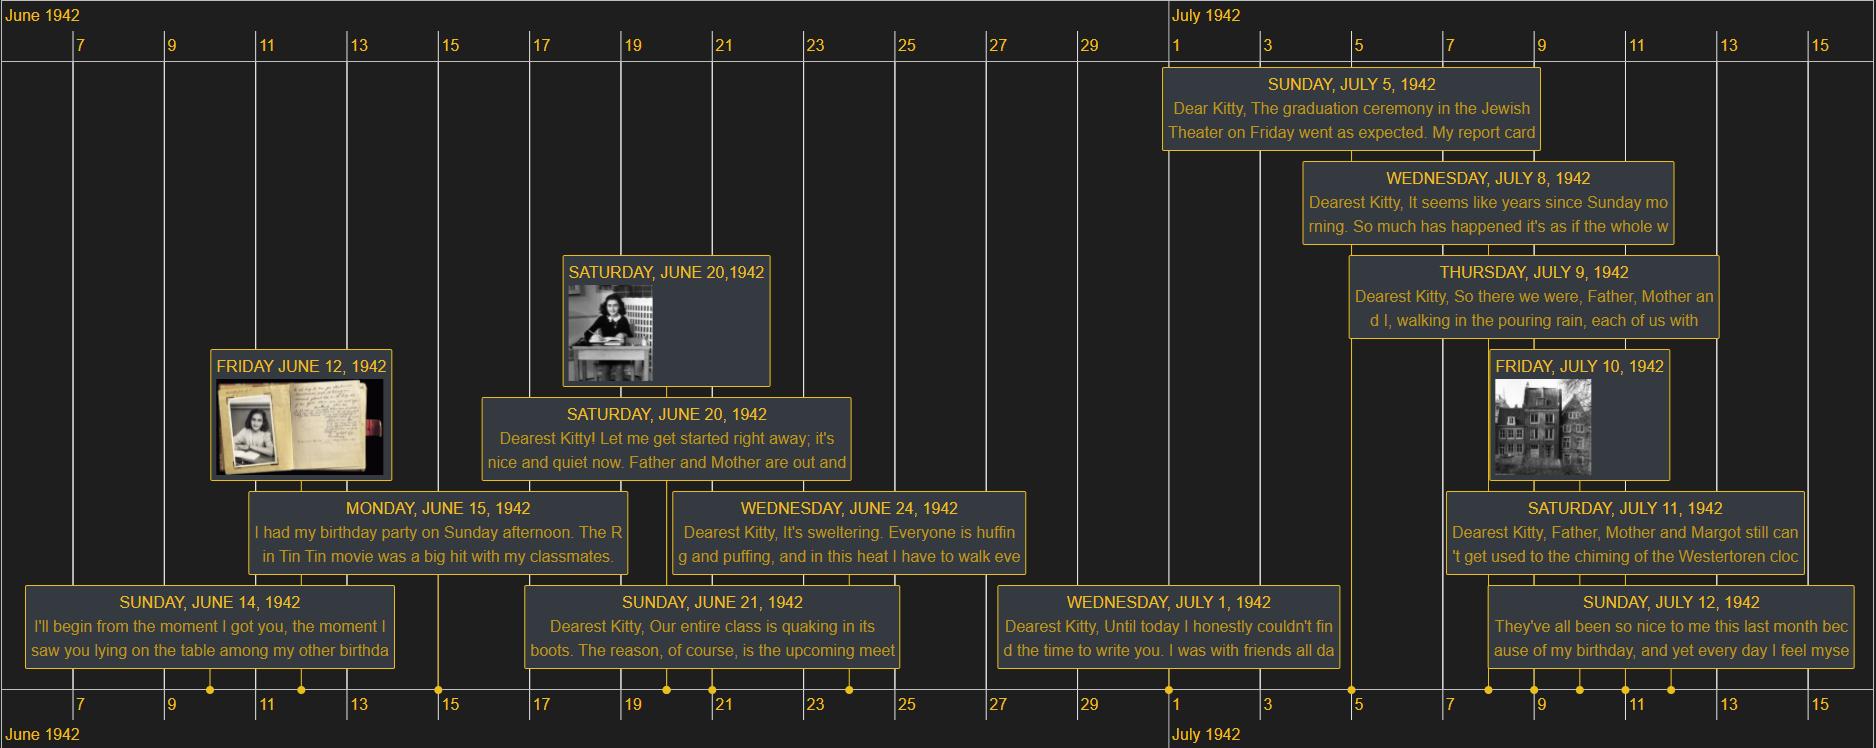 anne frank diary timeline